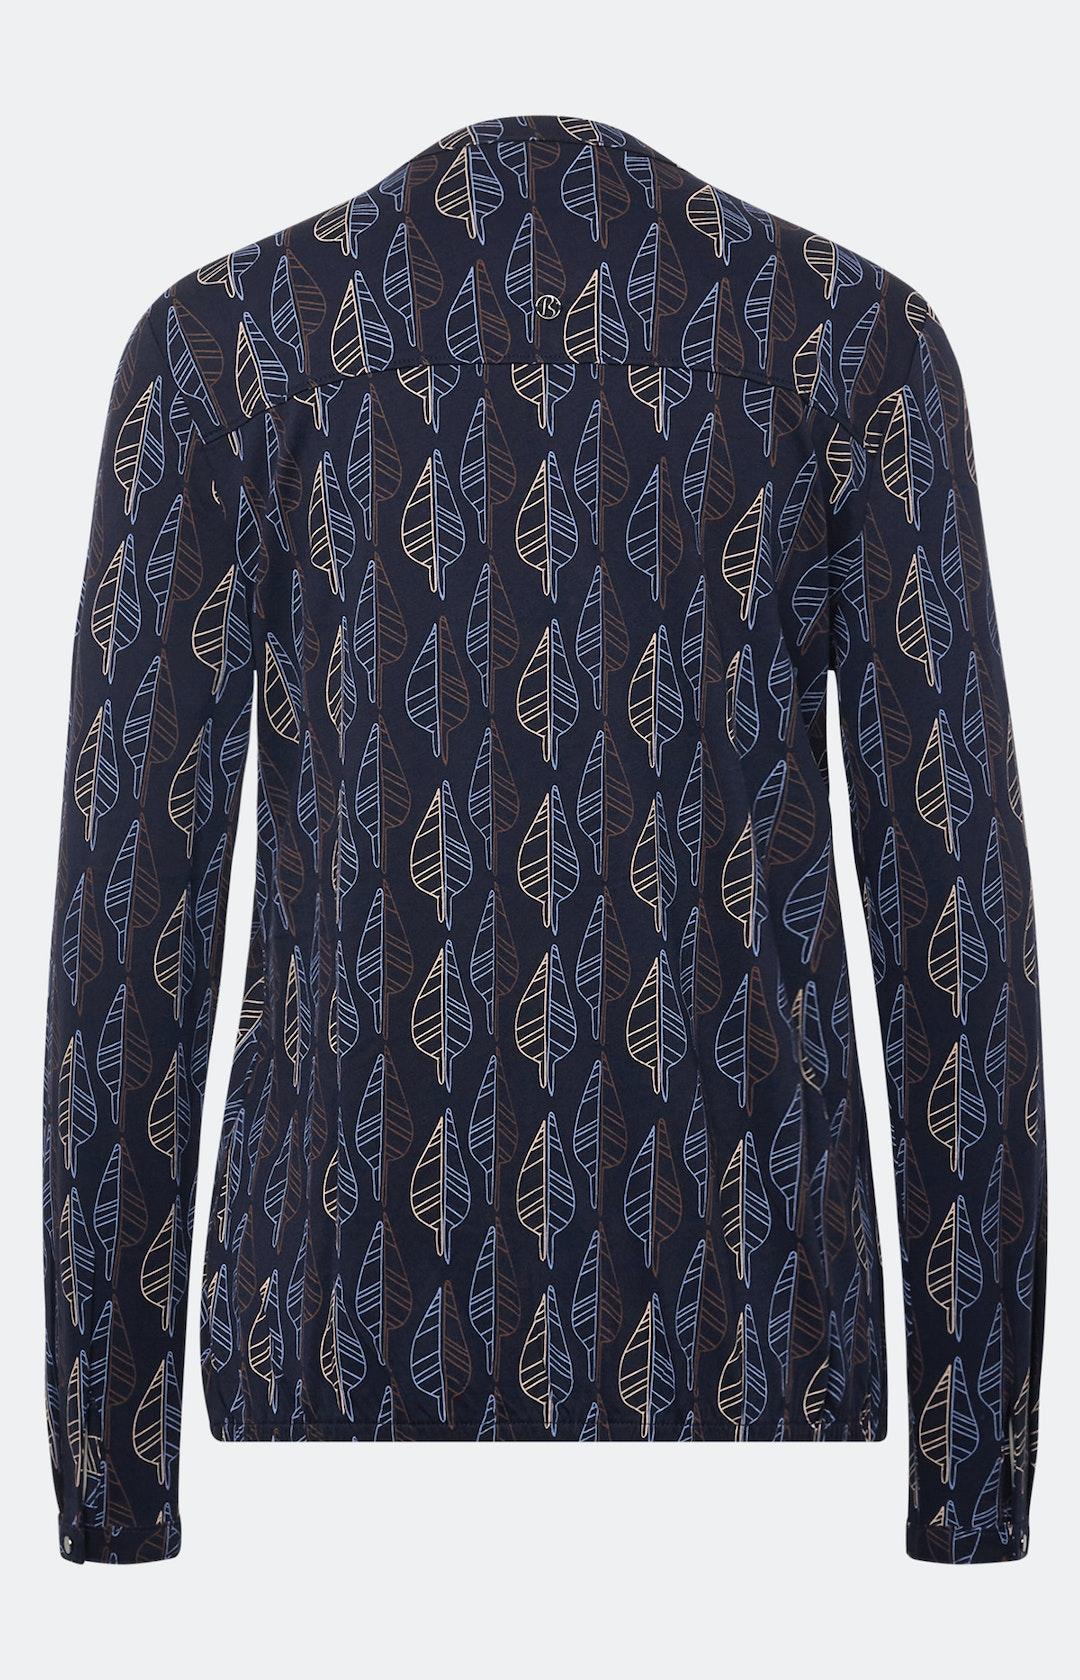 Shirt mit Allover-Muster in Dunkelblau